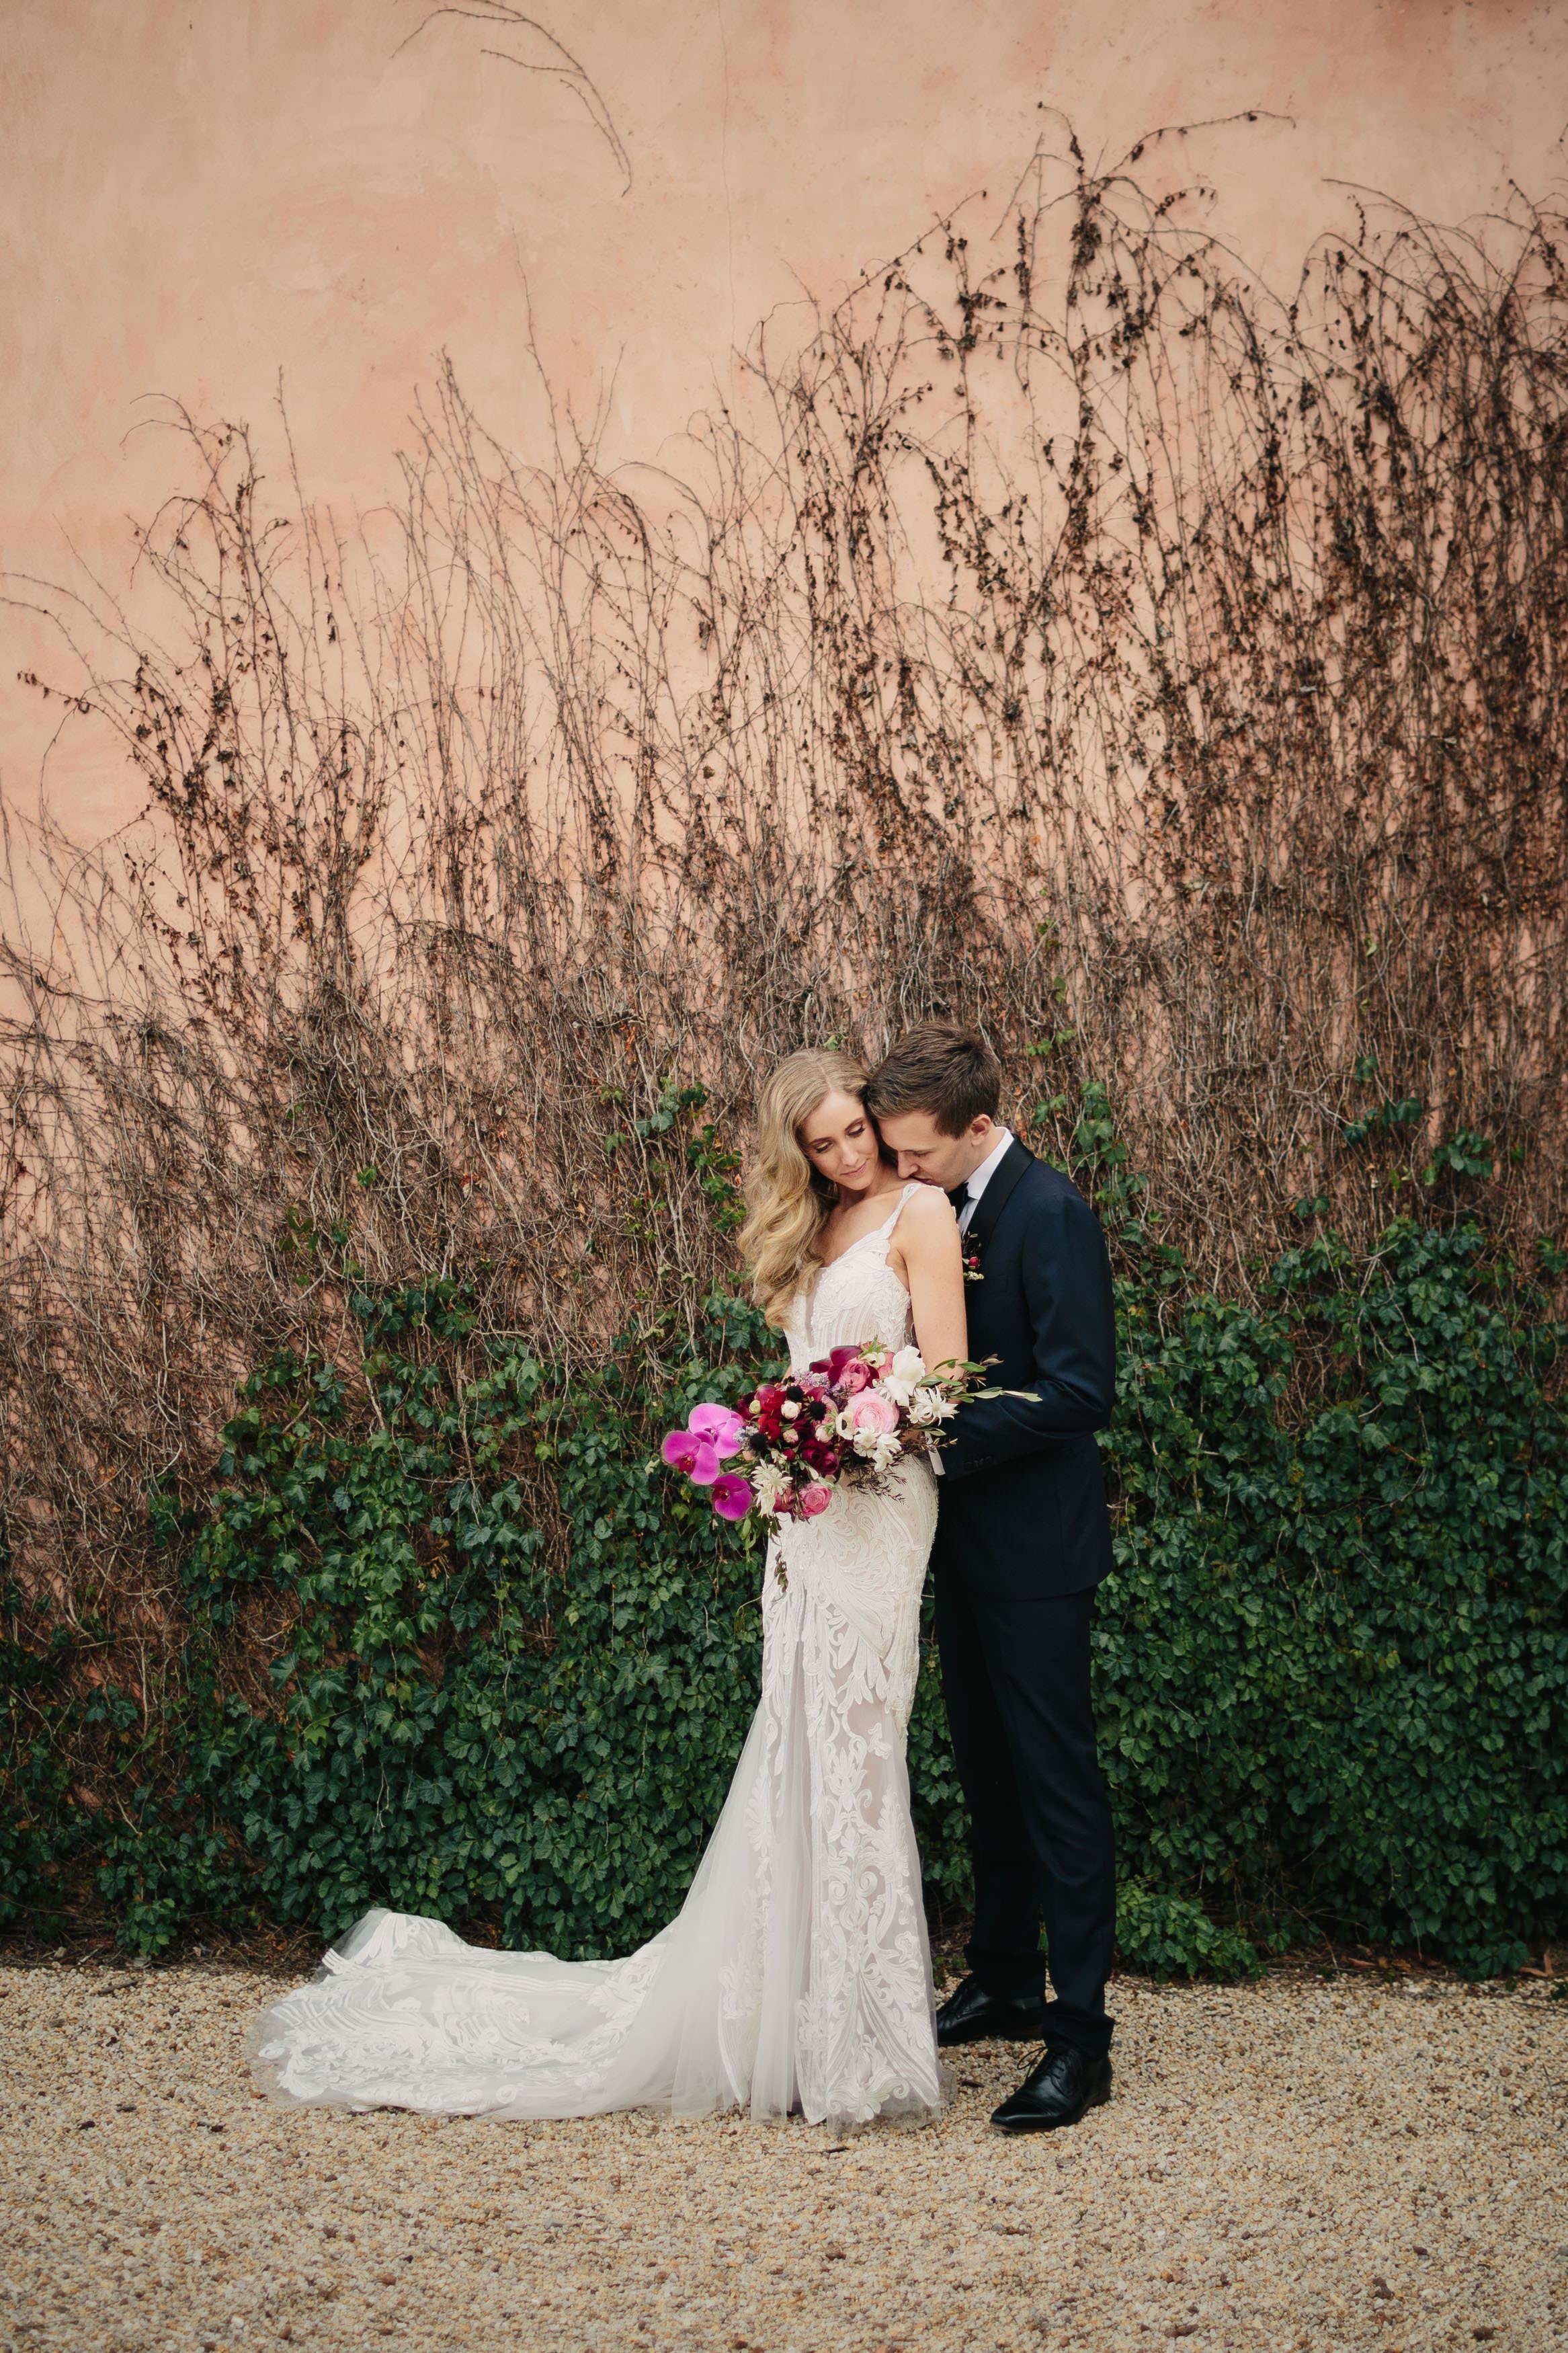 071_hunter_valley_wedding_photography_redleaf_paul_bamford_finchandoak.jpg